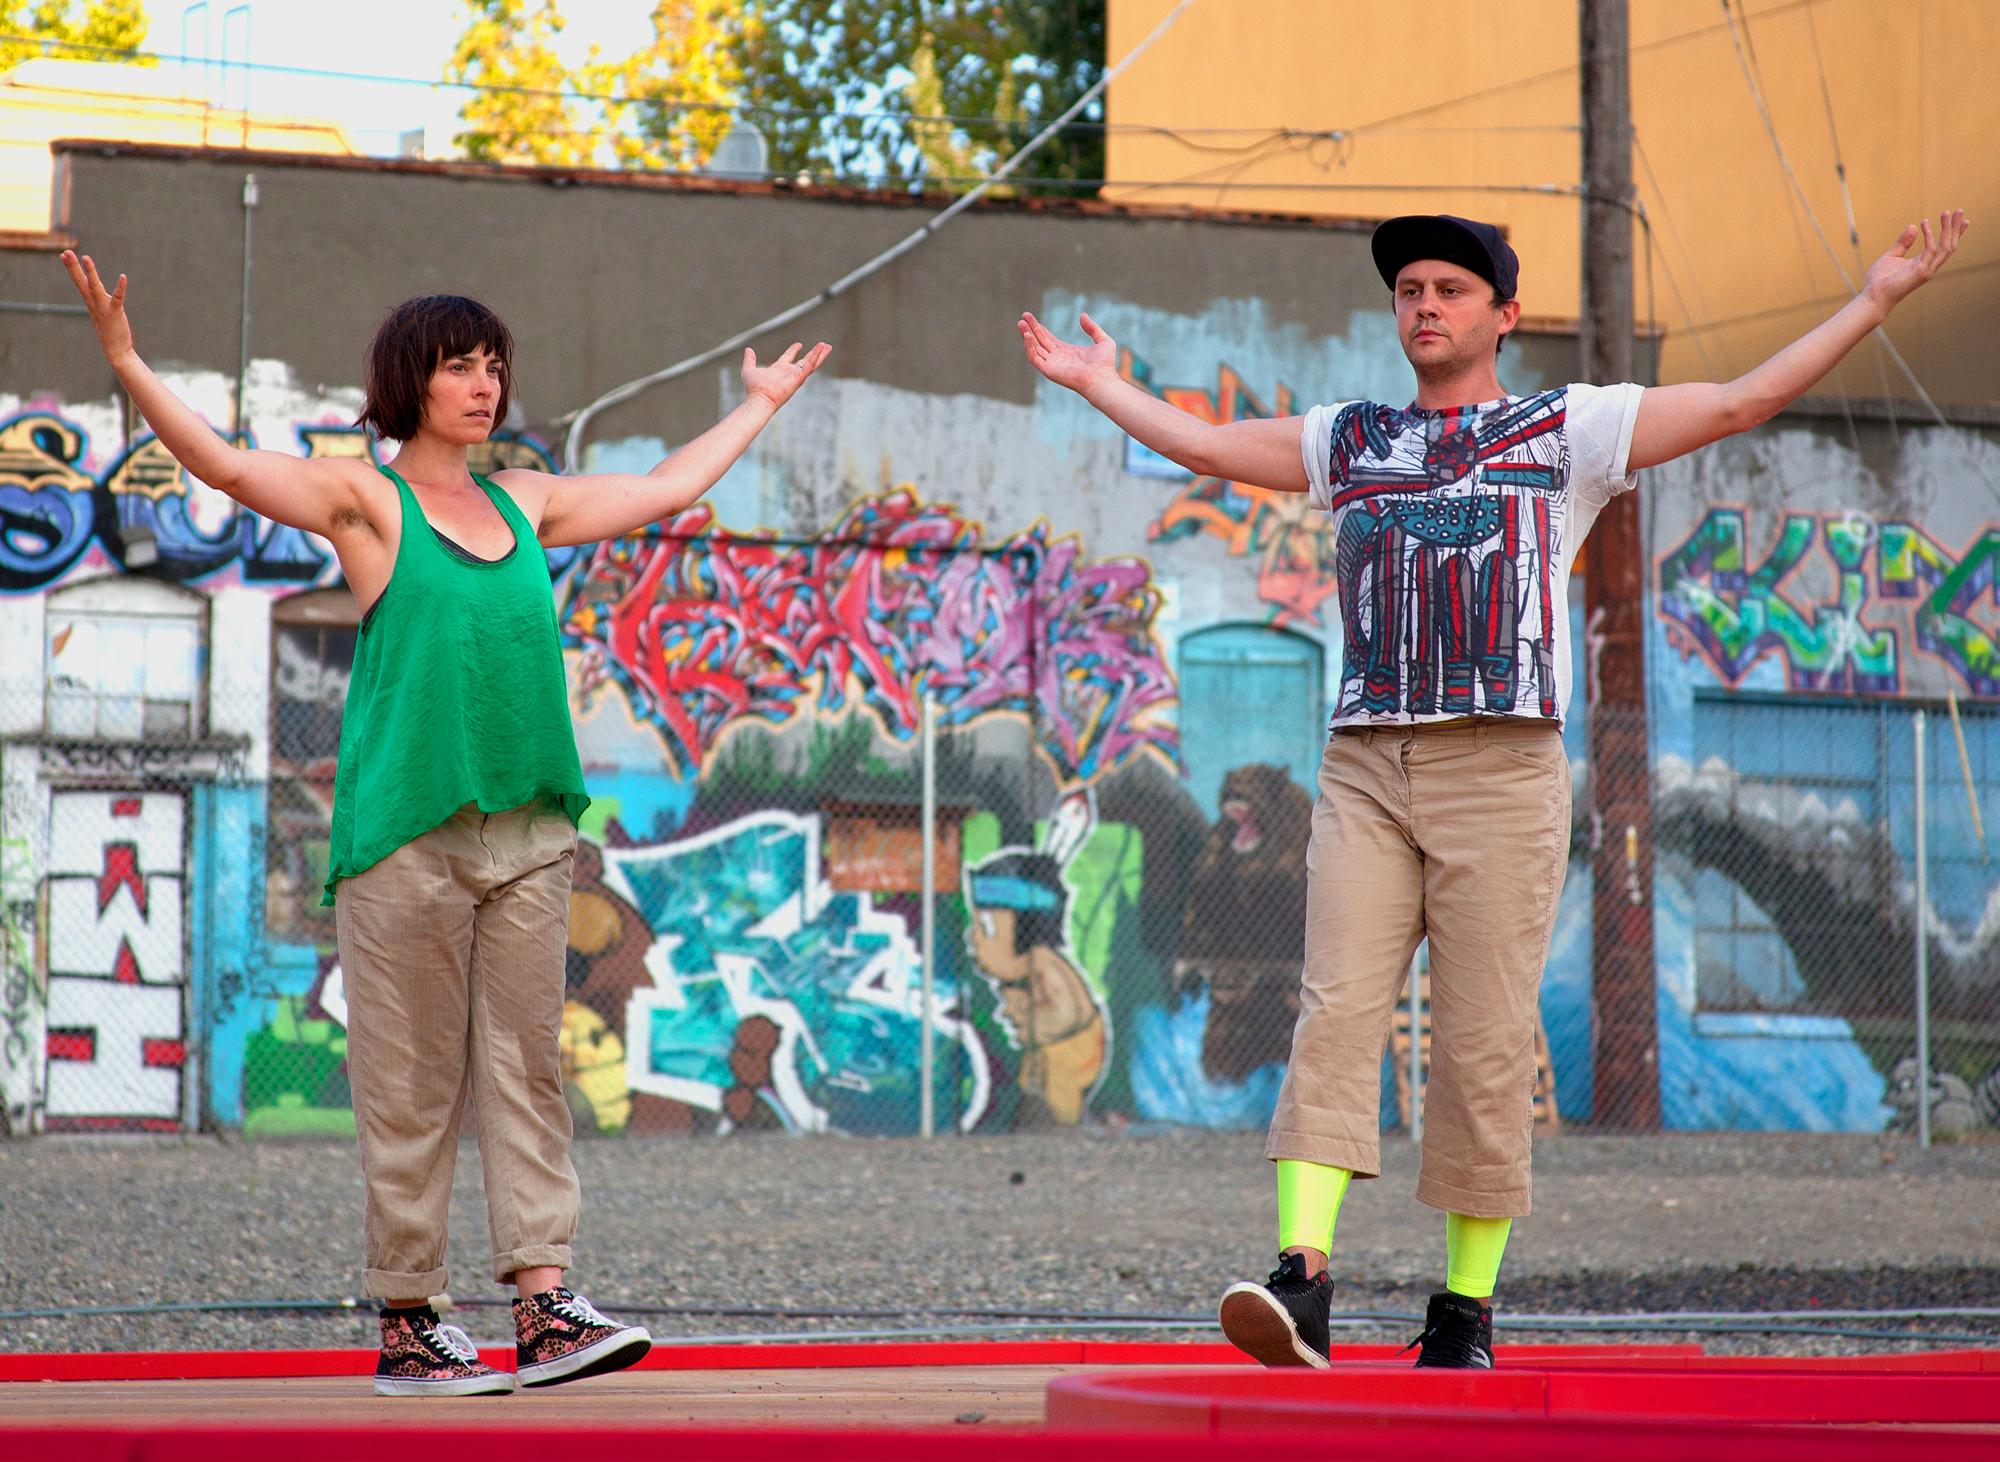 Tahni Holt for In Situ improvisational dance residencies